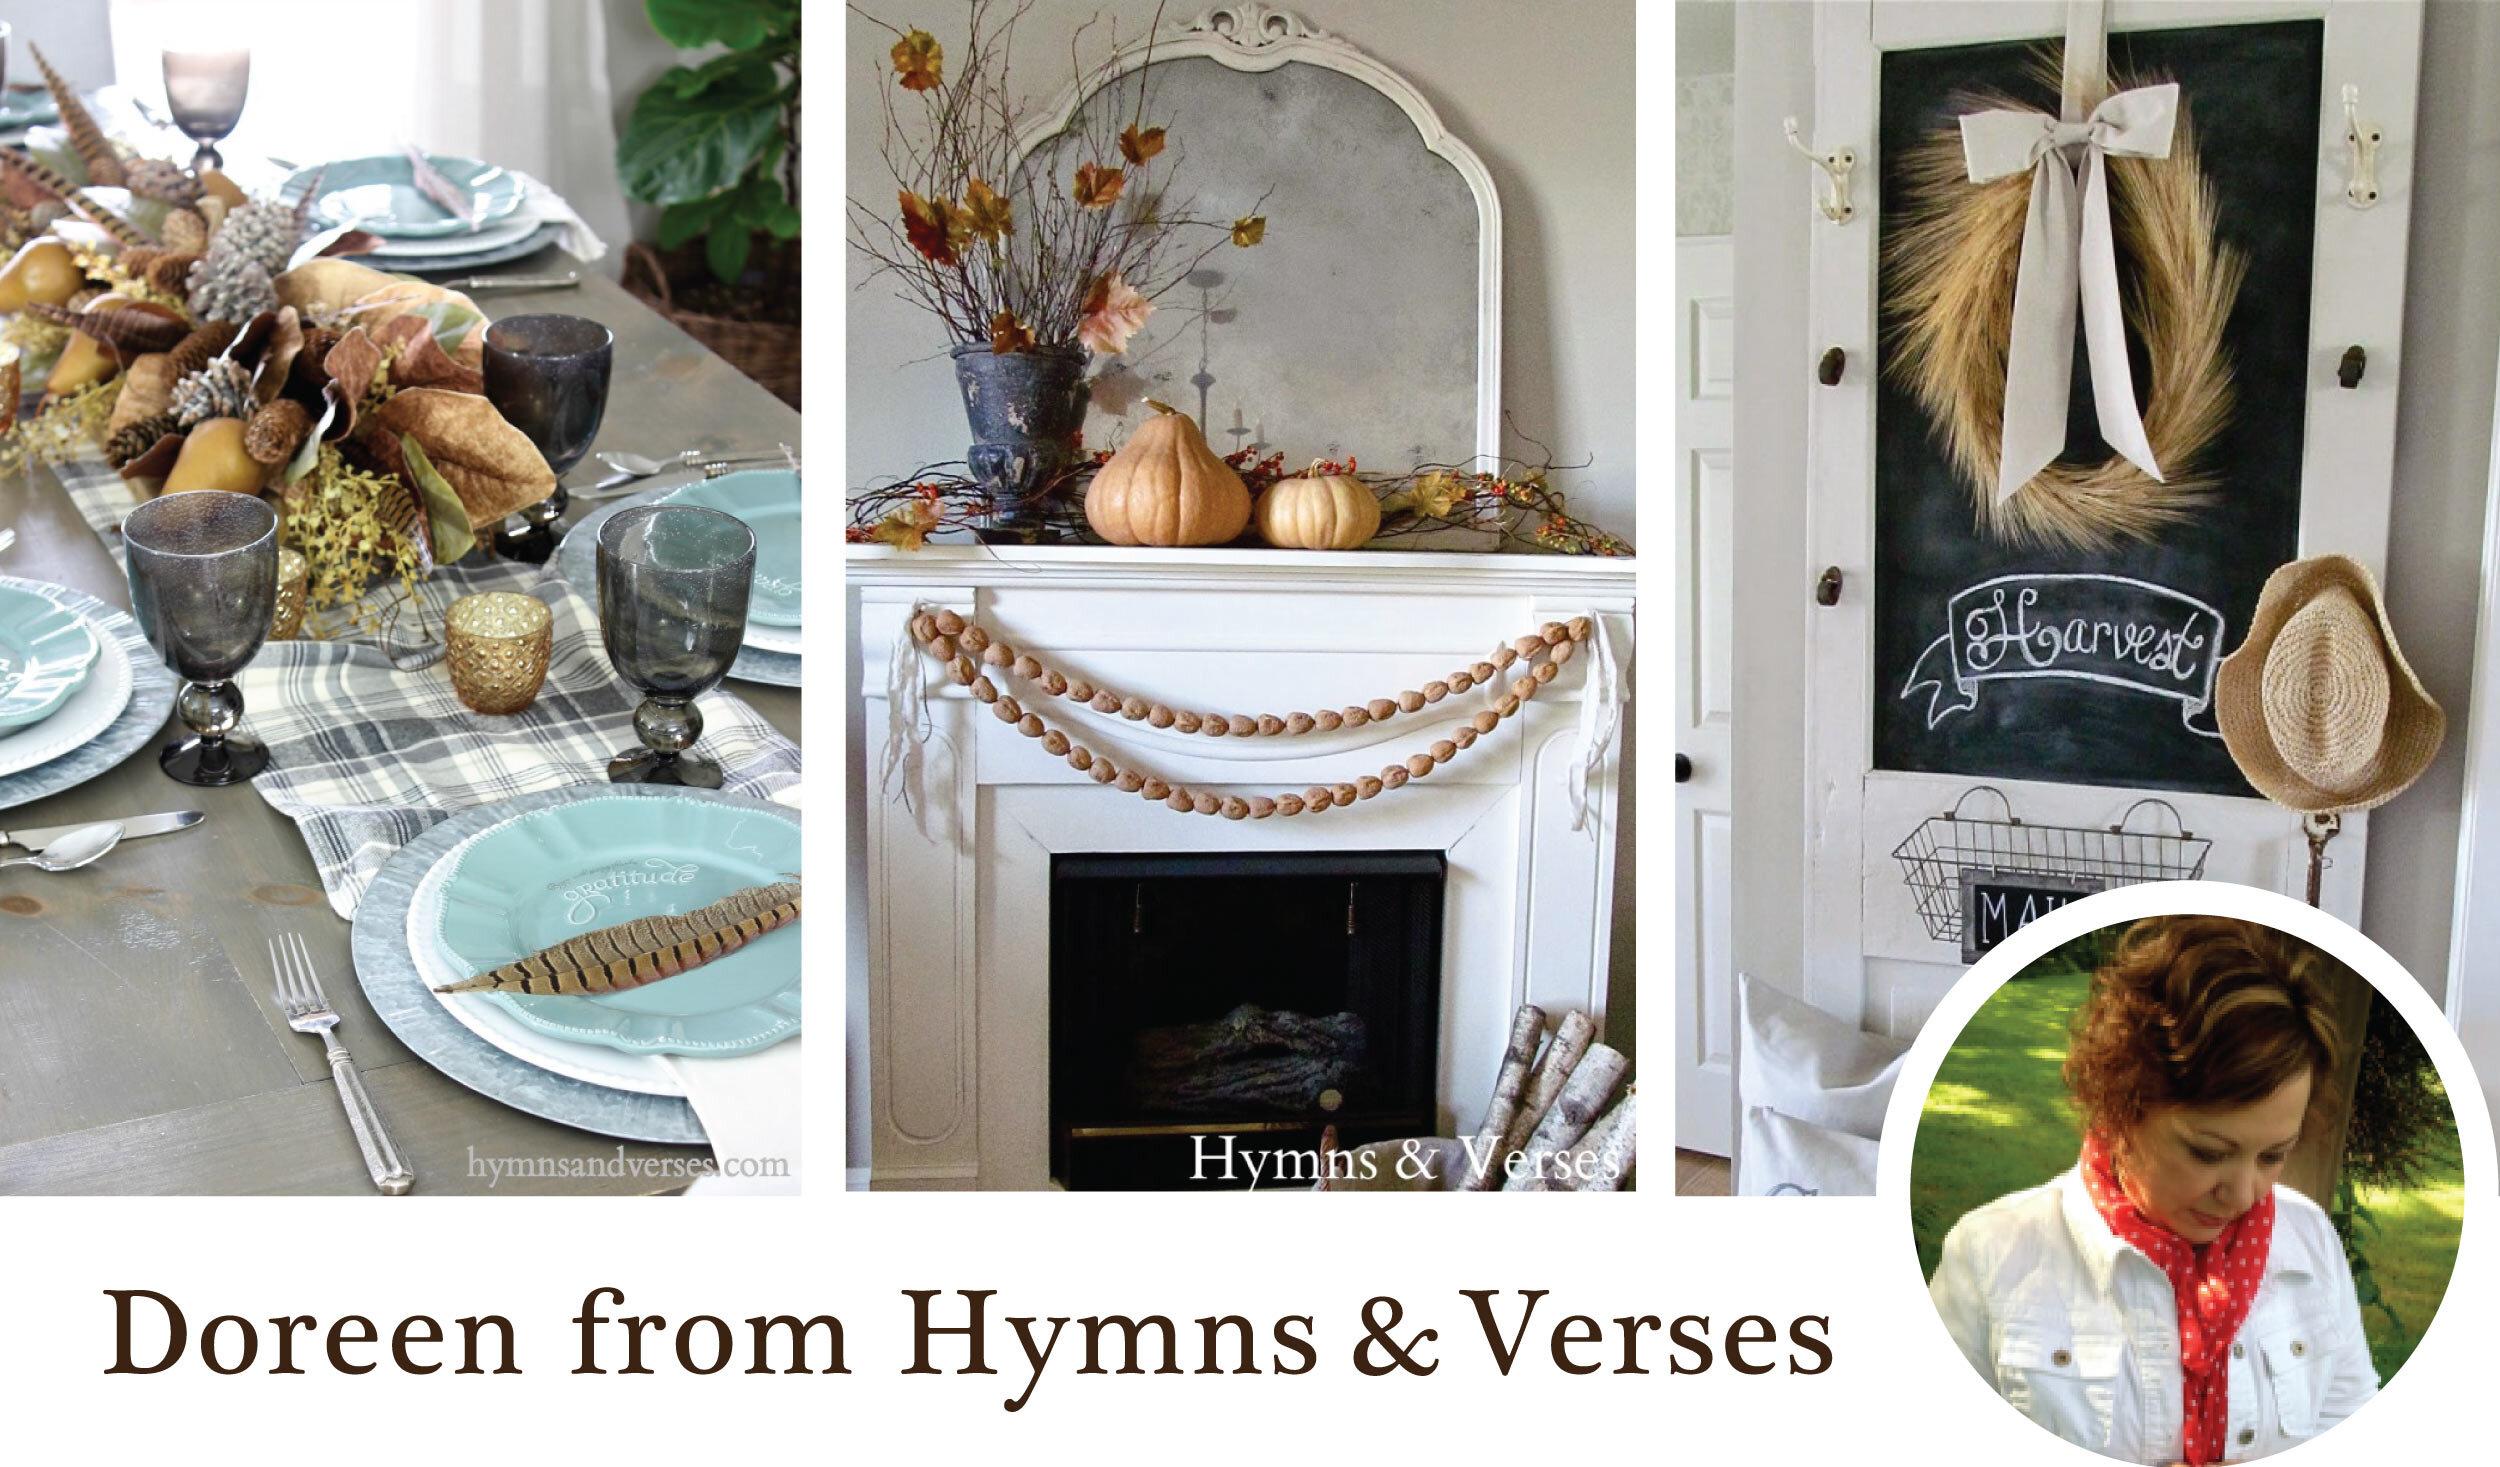 BWL-header-hymns-and-verses.jpg